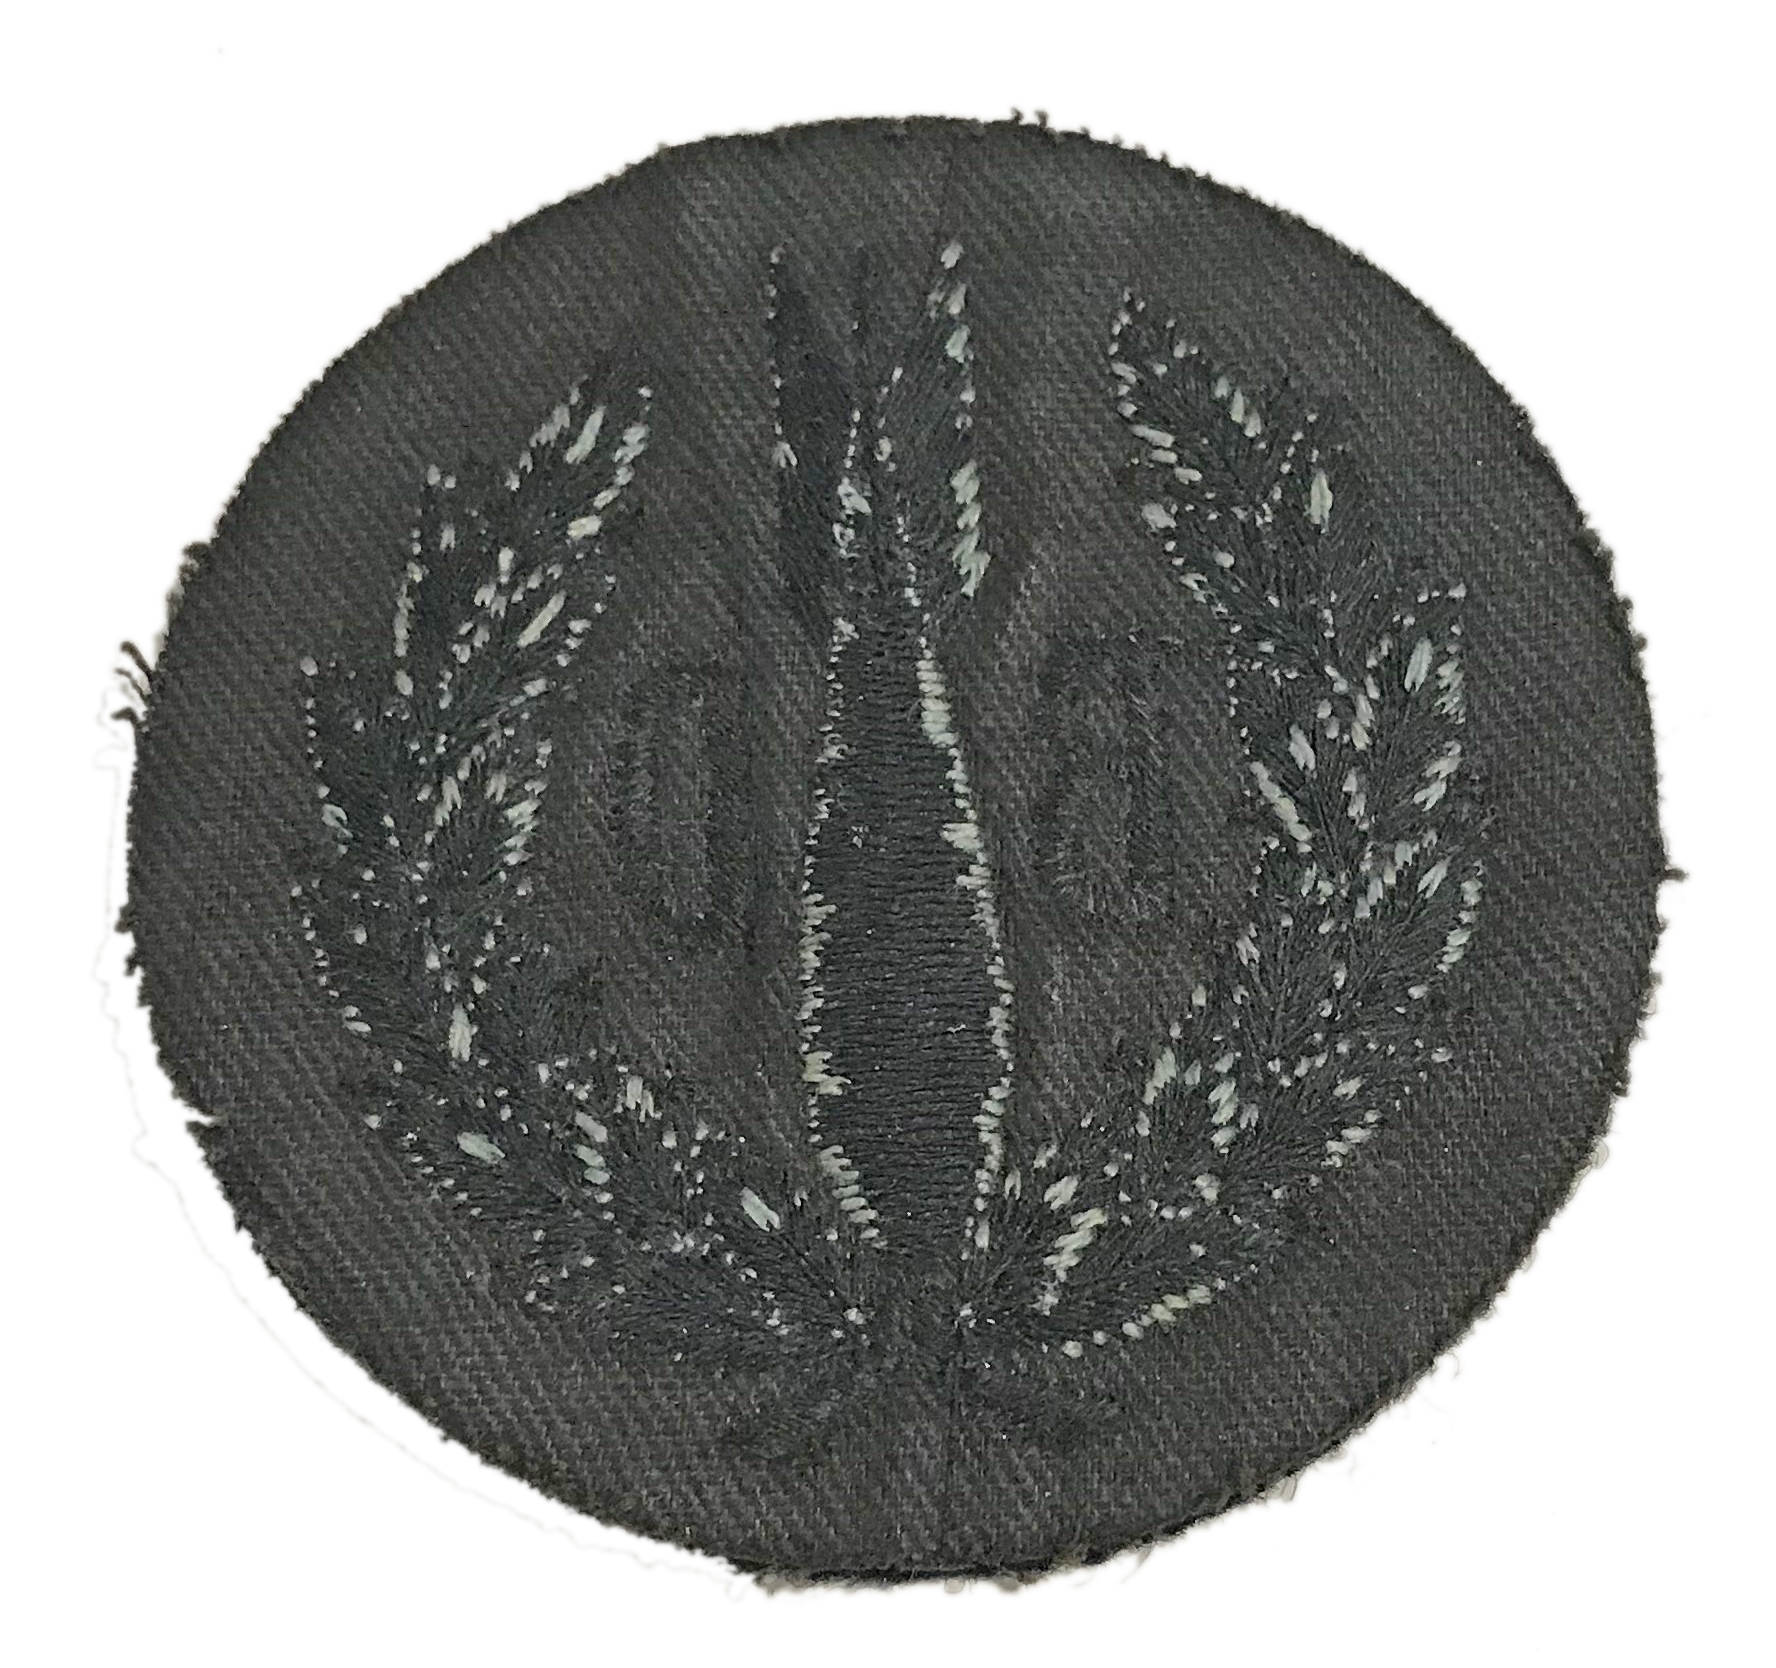 RAF Bomb Disposal badge